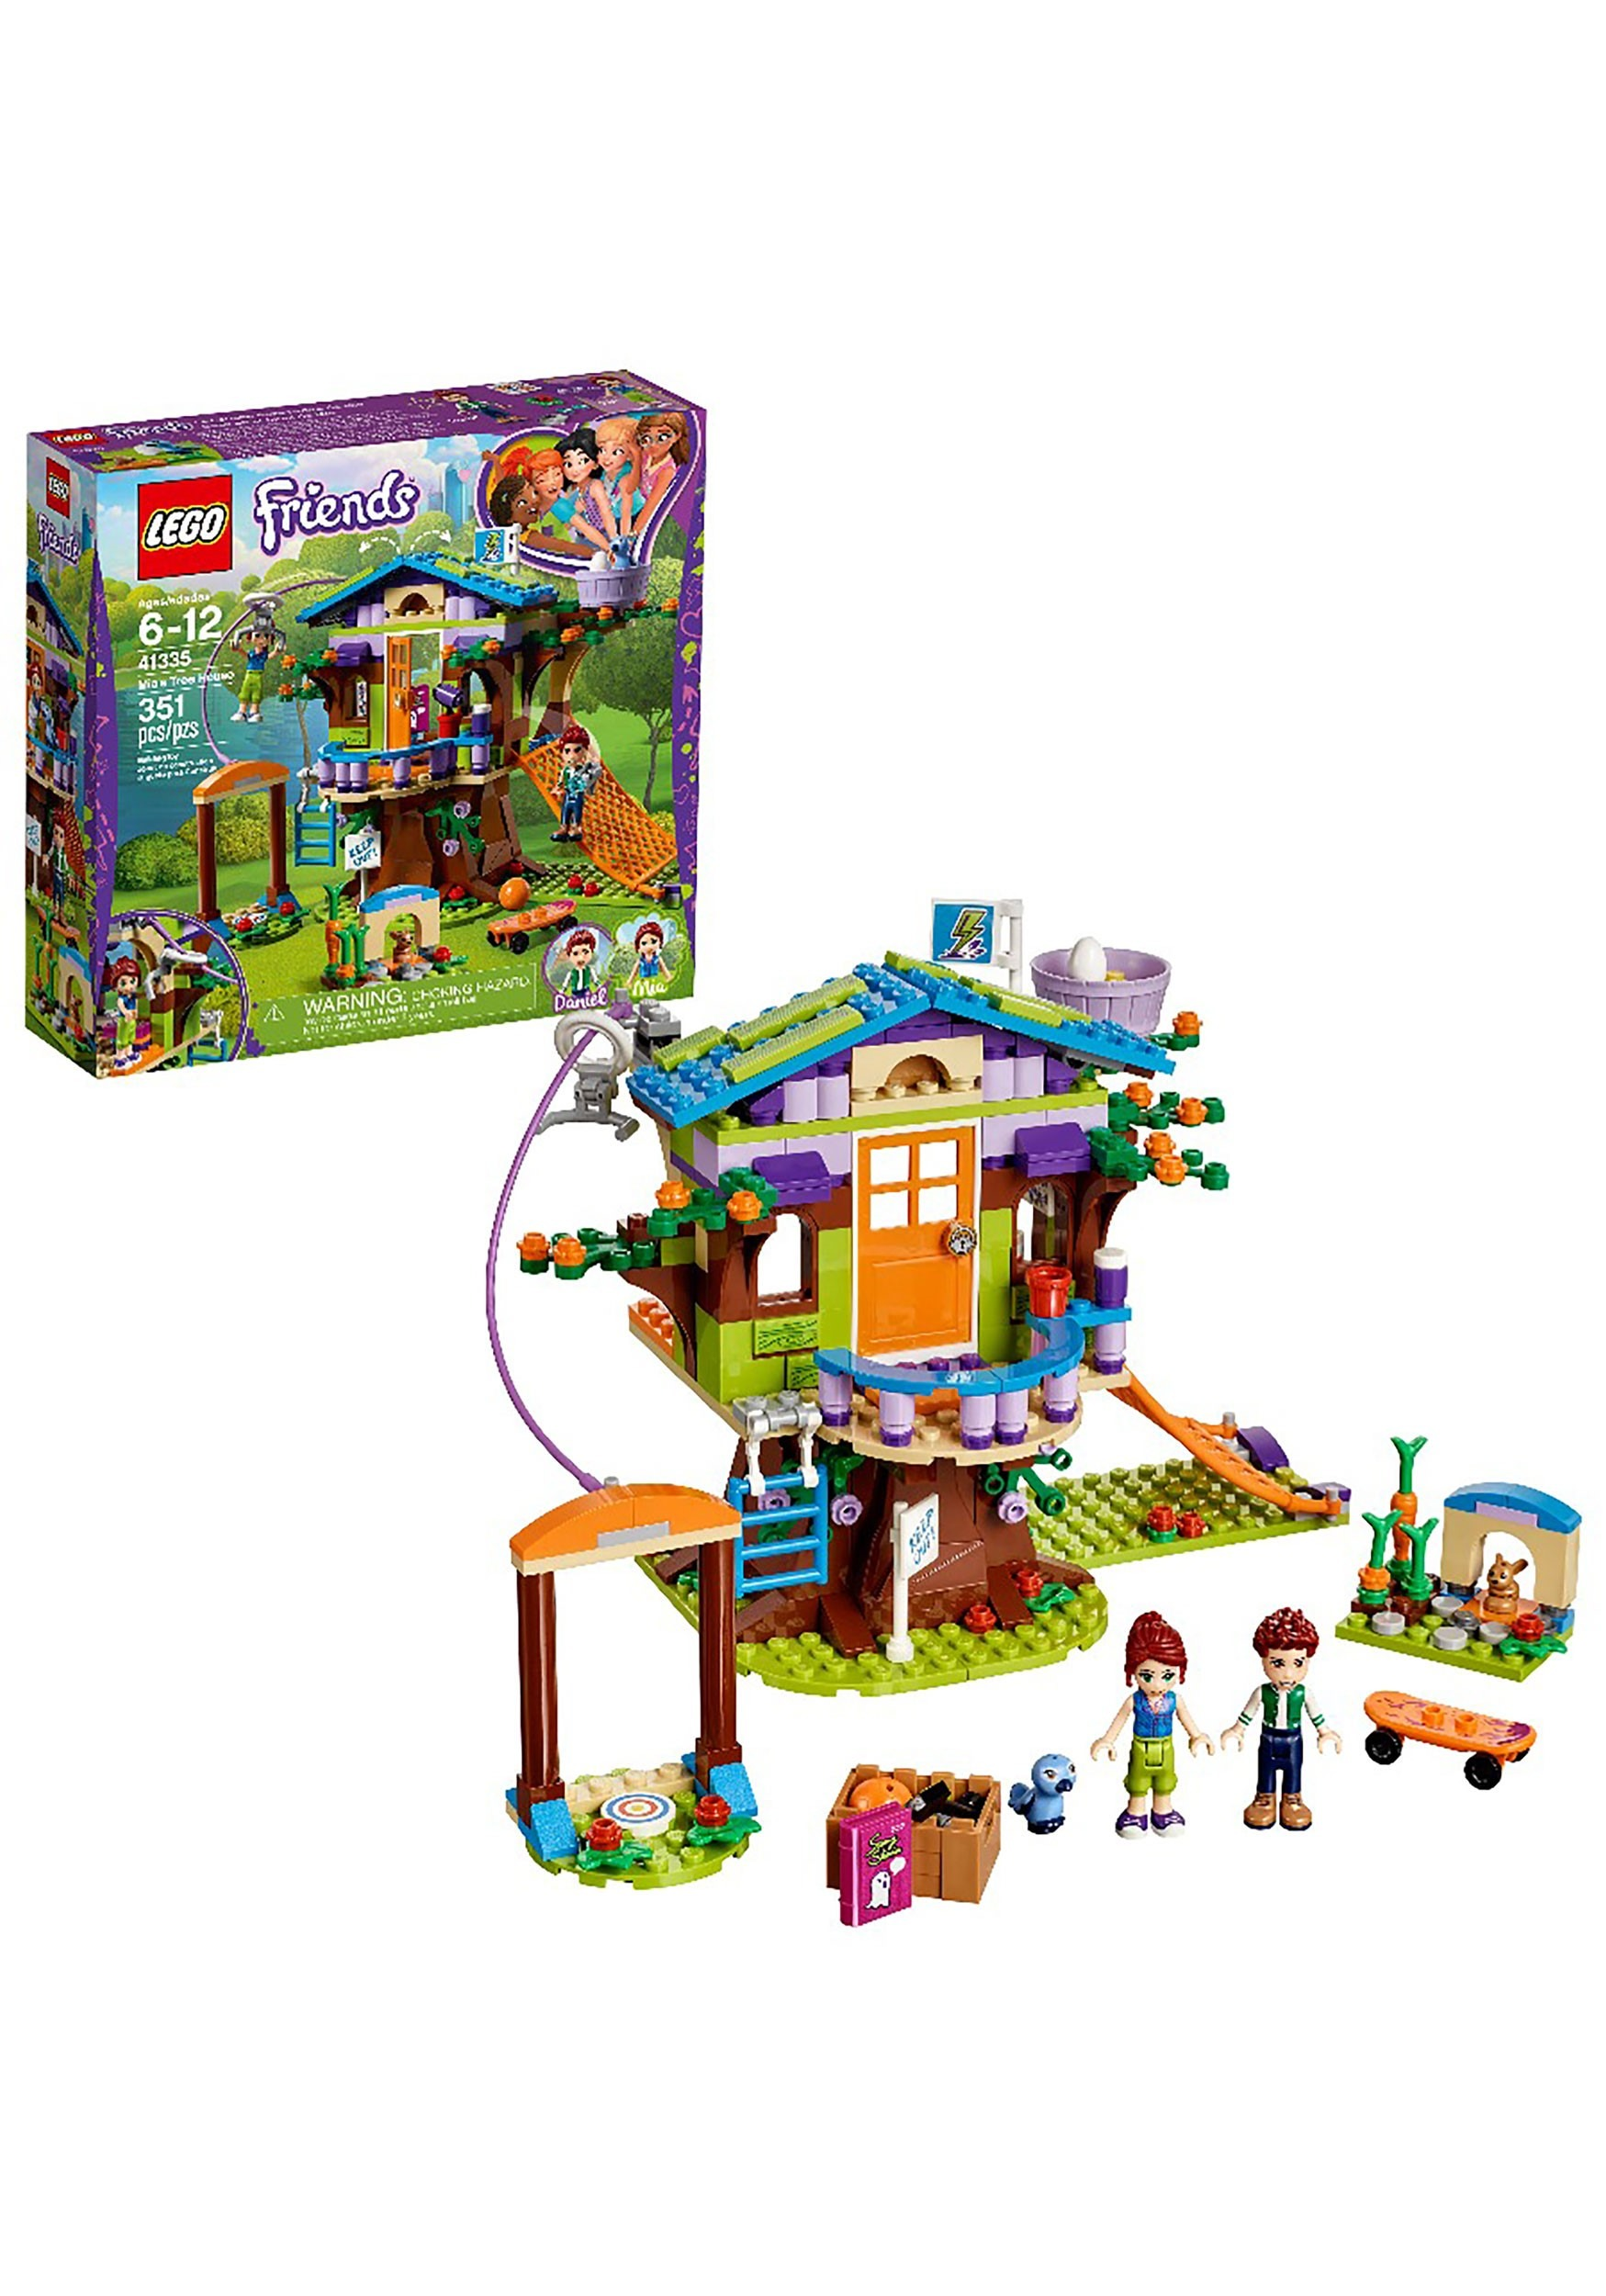 LEGO Friends 351pc Mia's Tree House Building Set